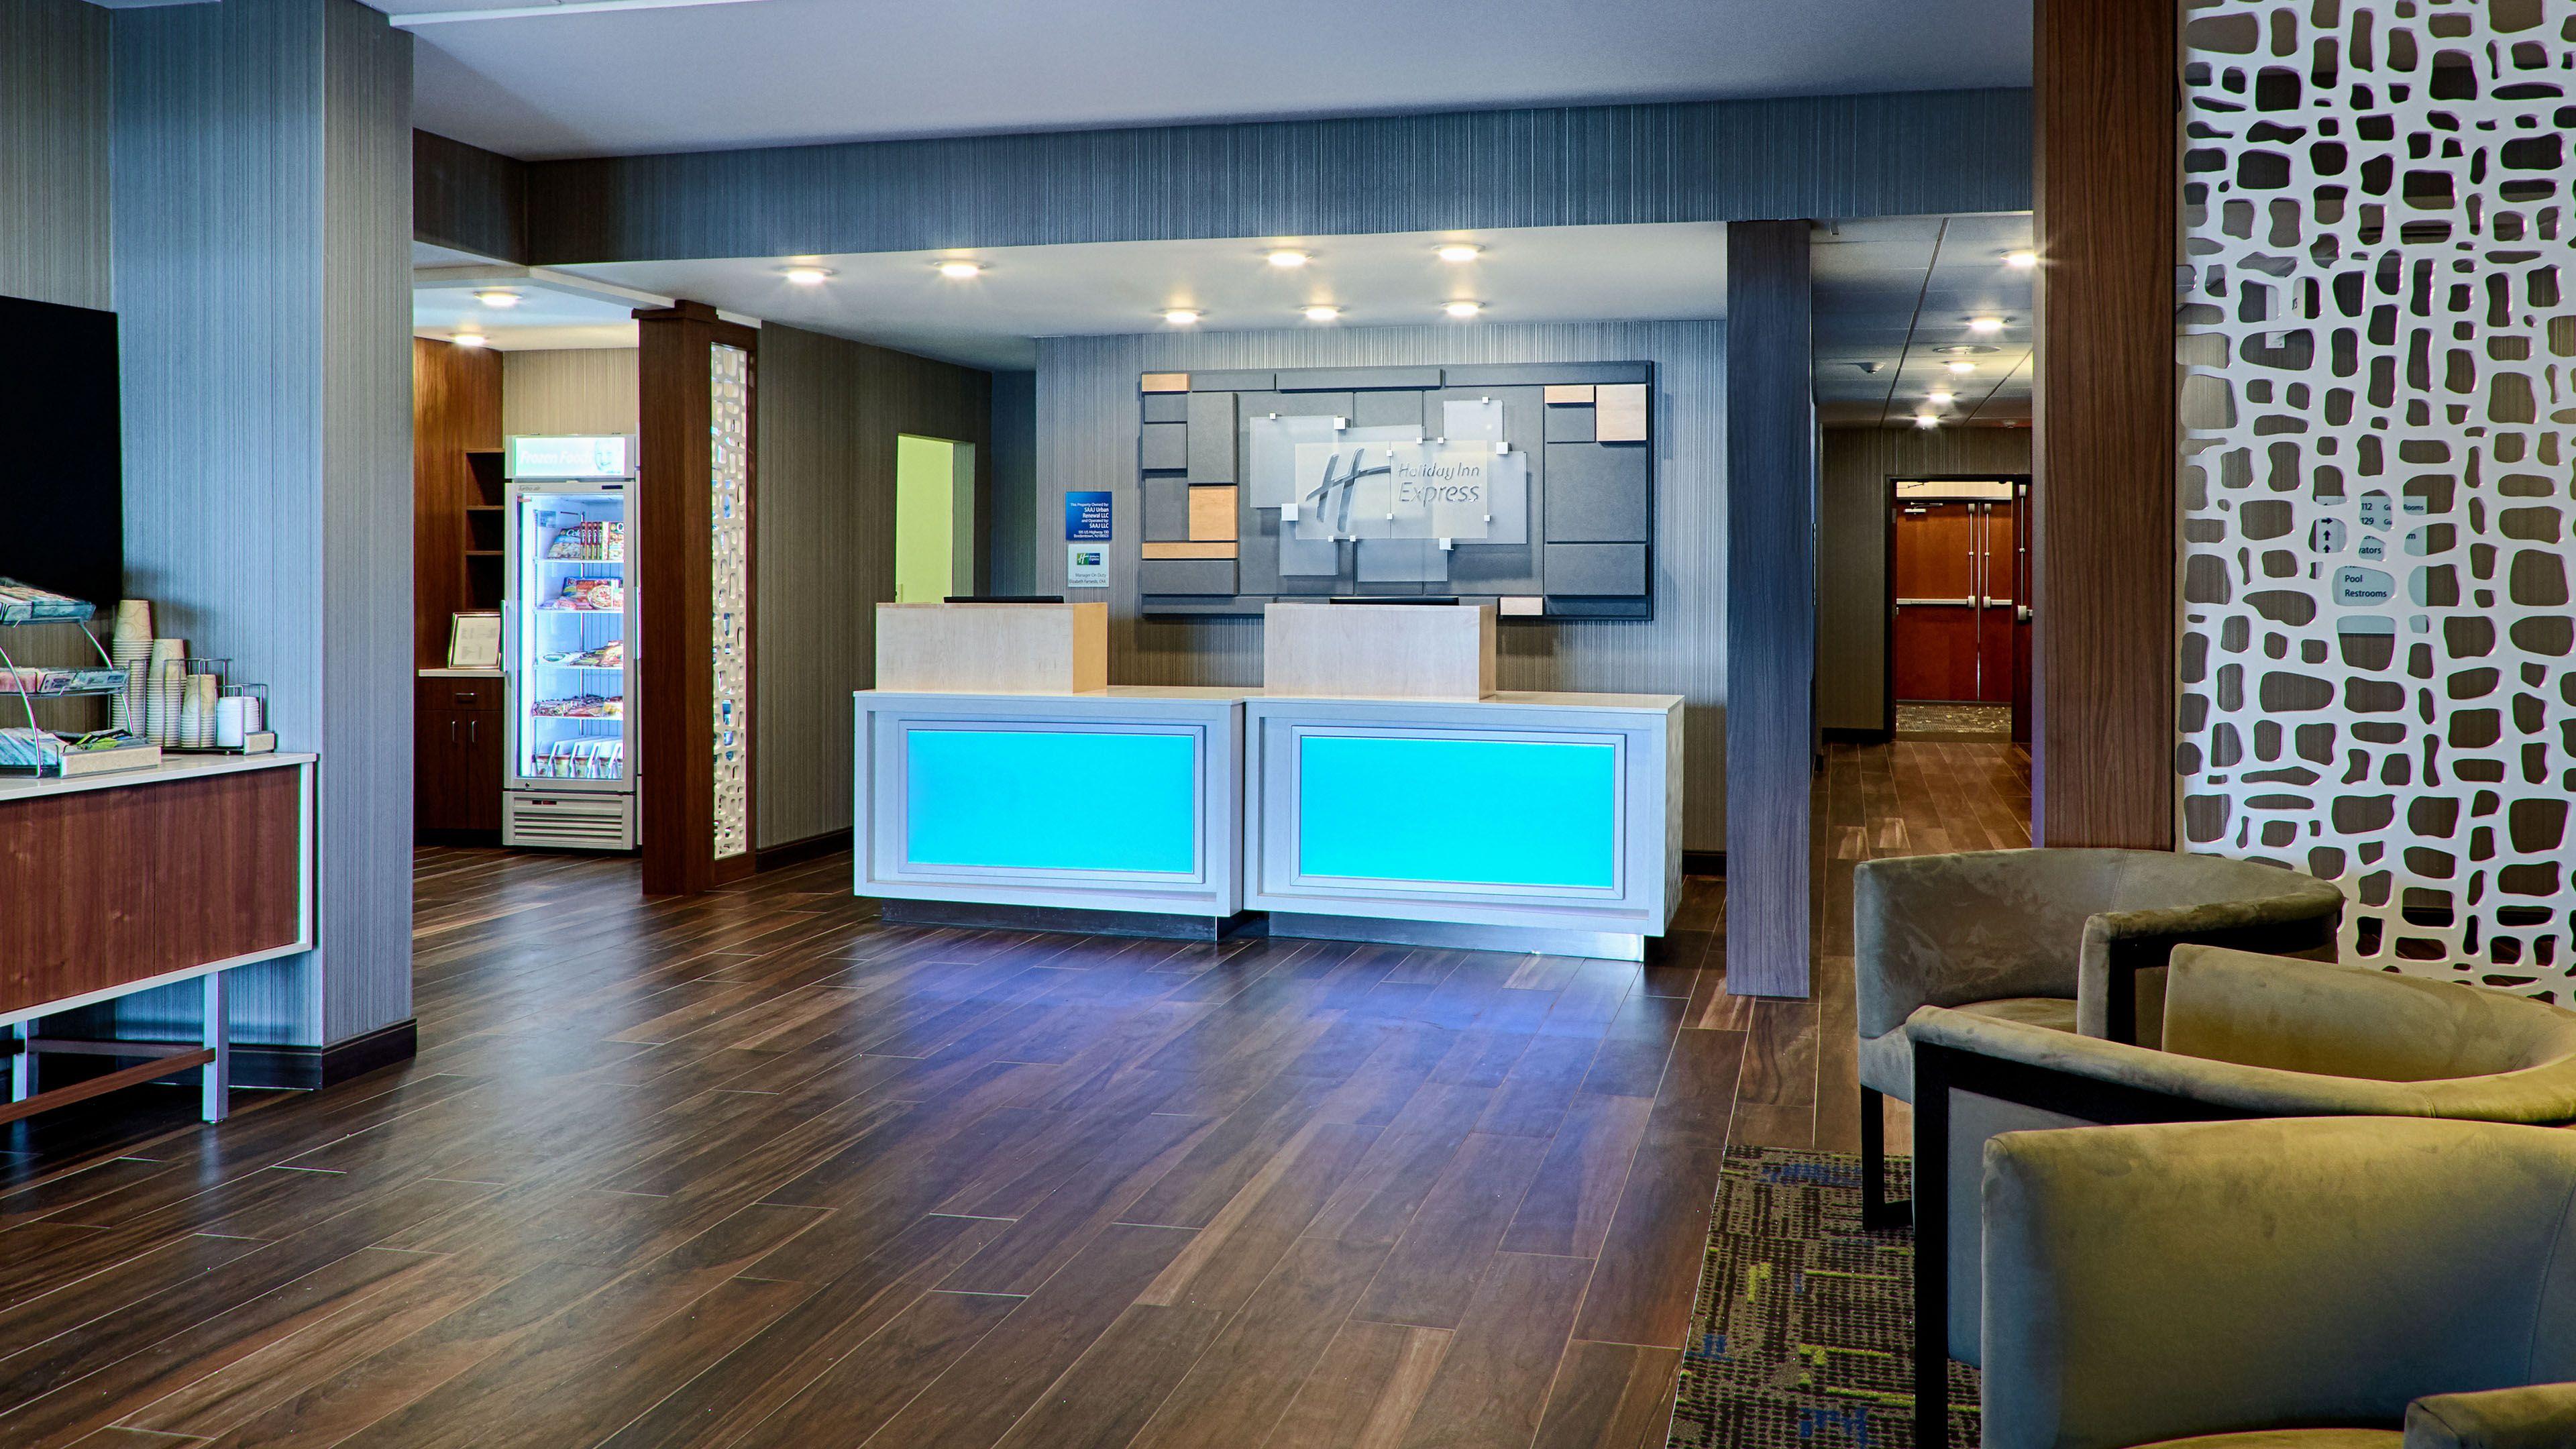 Holiday Inn Express Bordentown - Trenton South image 5